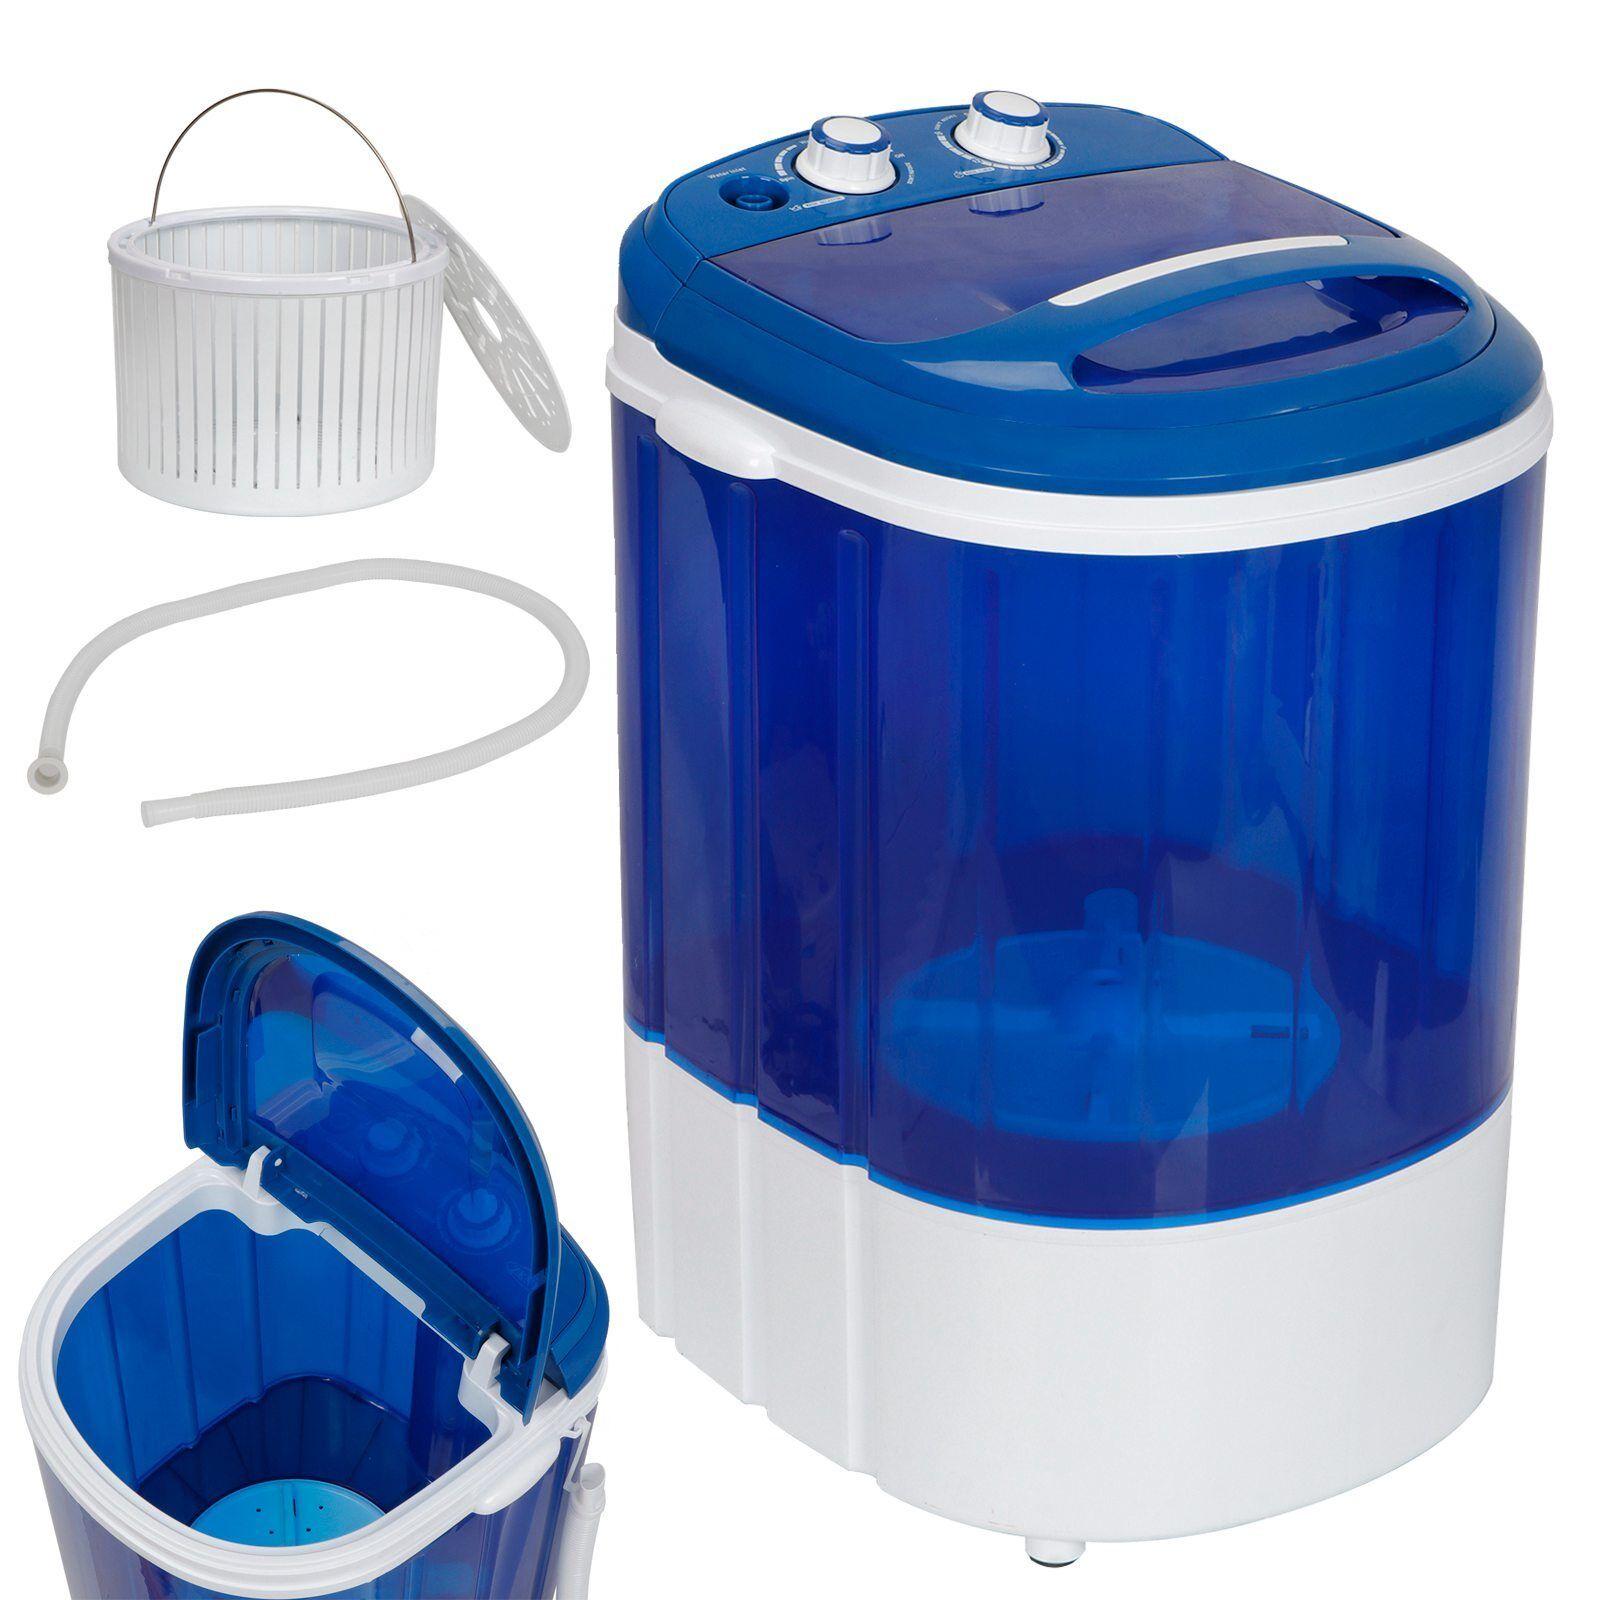 Portable Mini Laundry Washer 9 lbs Compact Washing Machine I